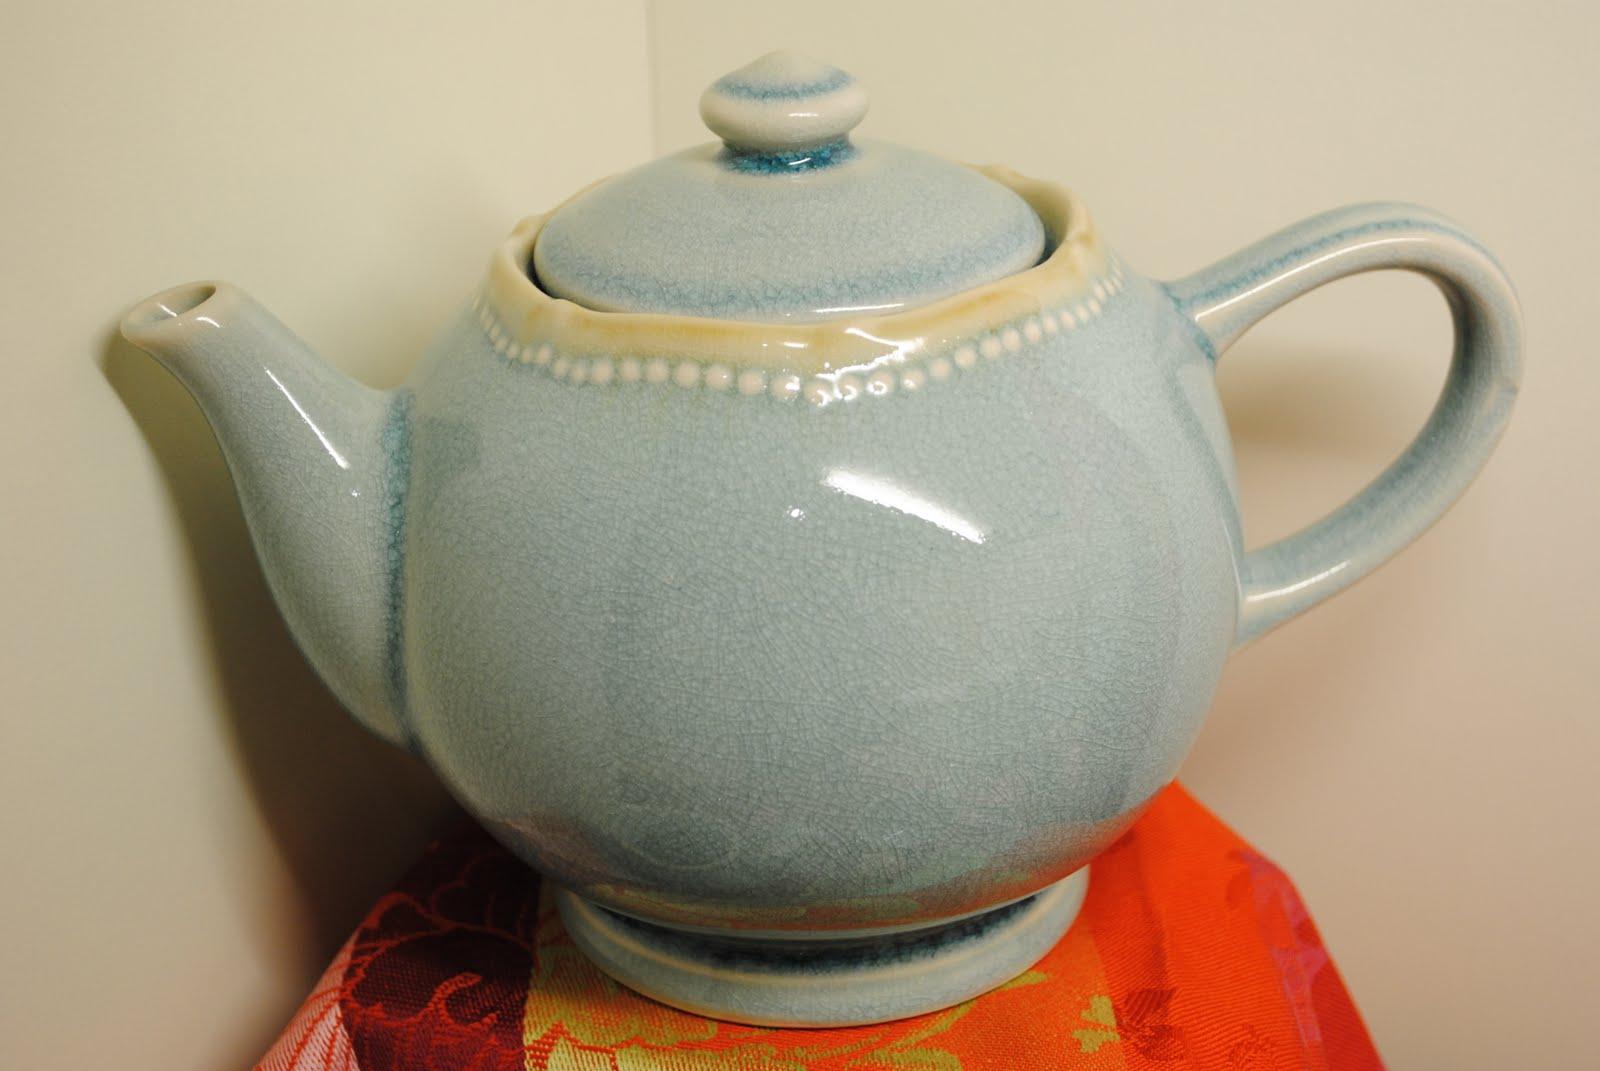 Genevieve Lethu Chicago Teapots Vs Tea Kettles